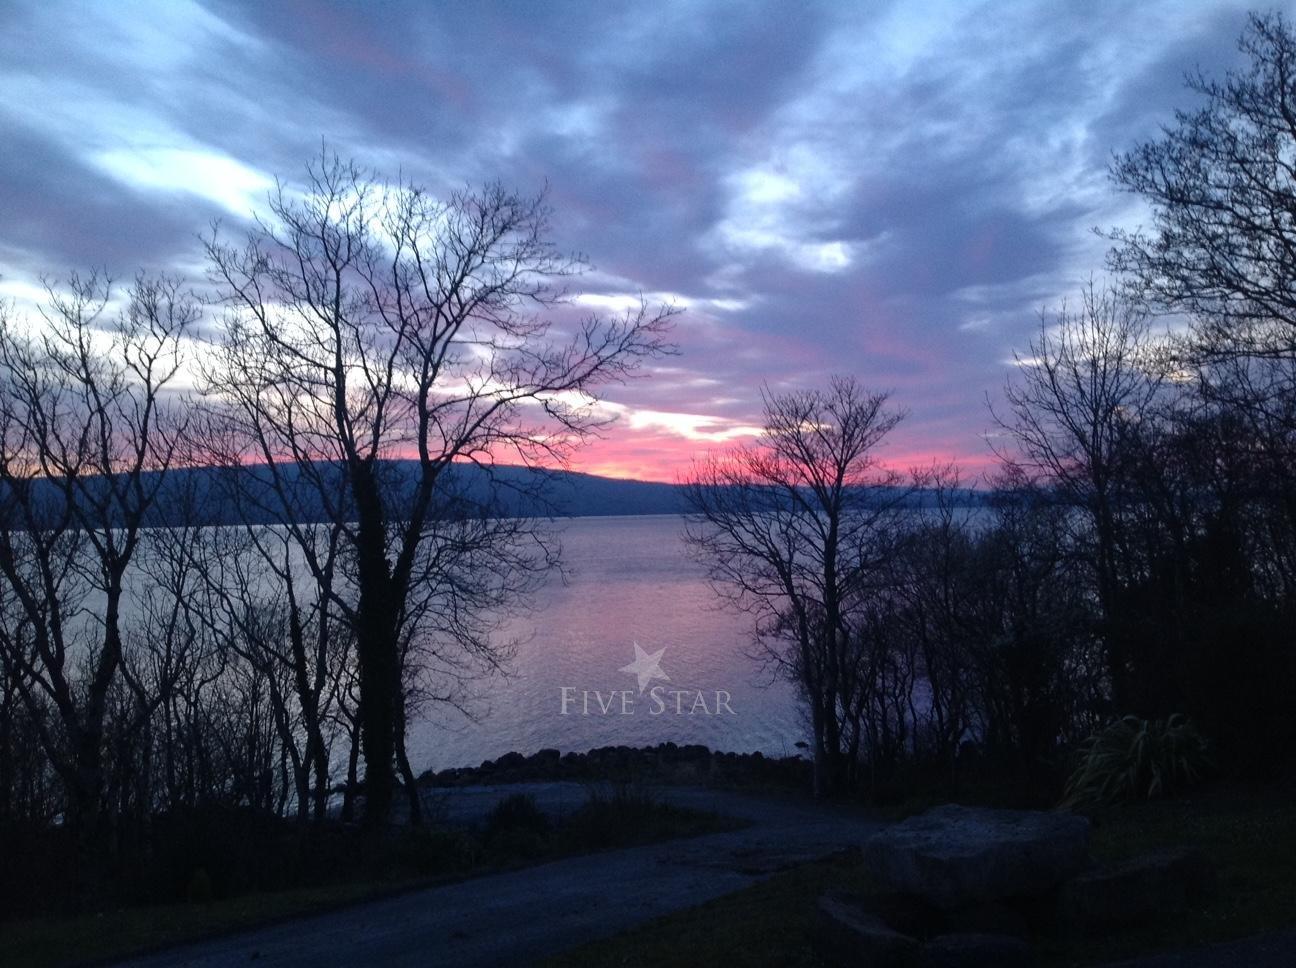 Ceo na Locha photo 7